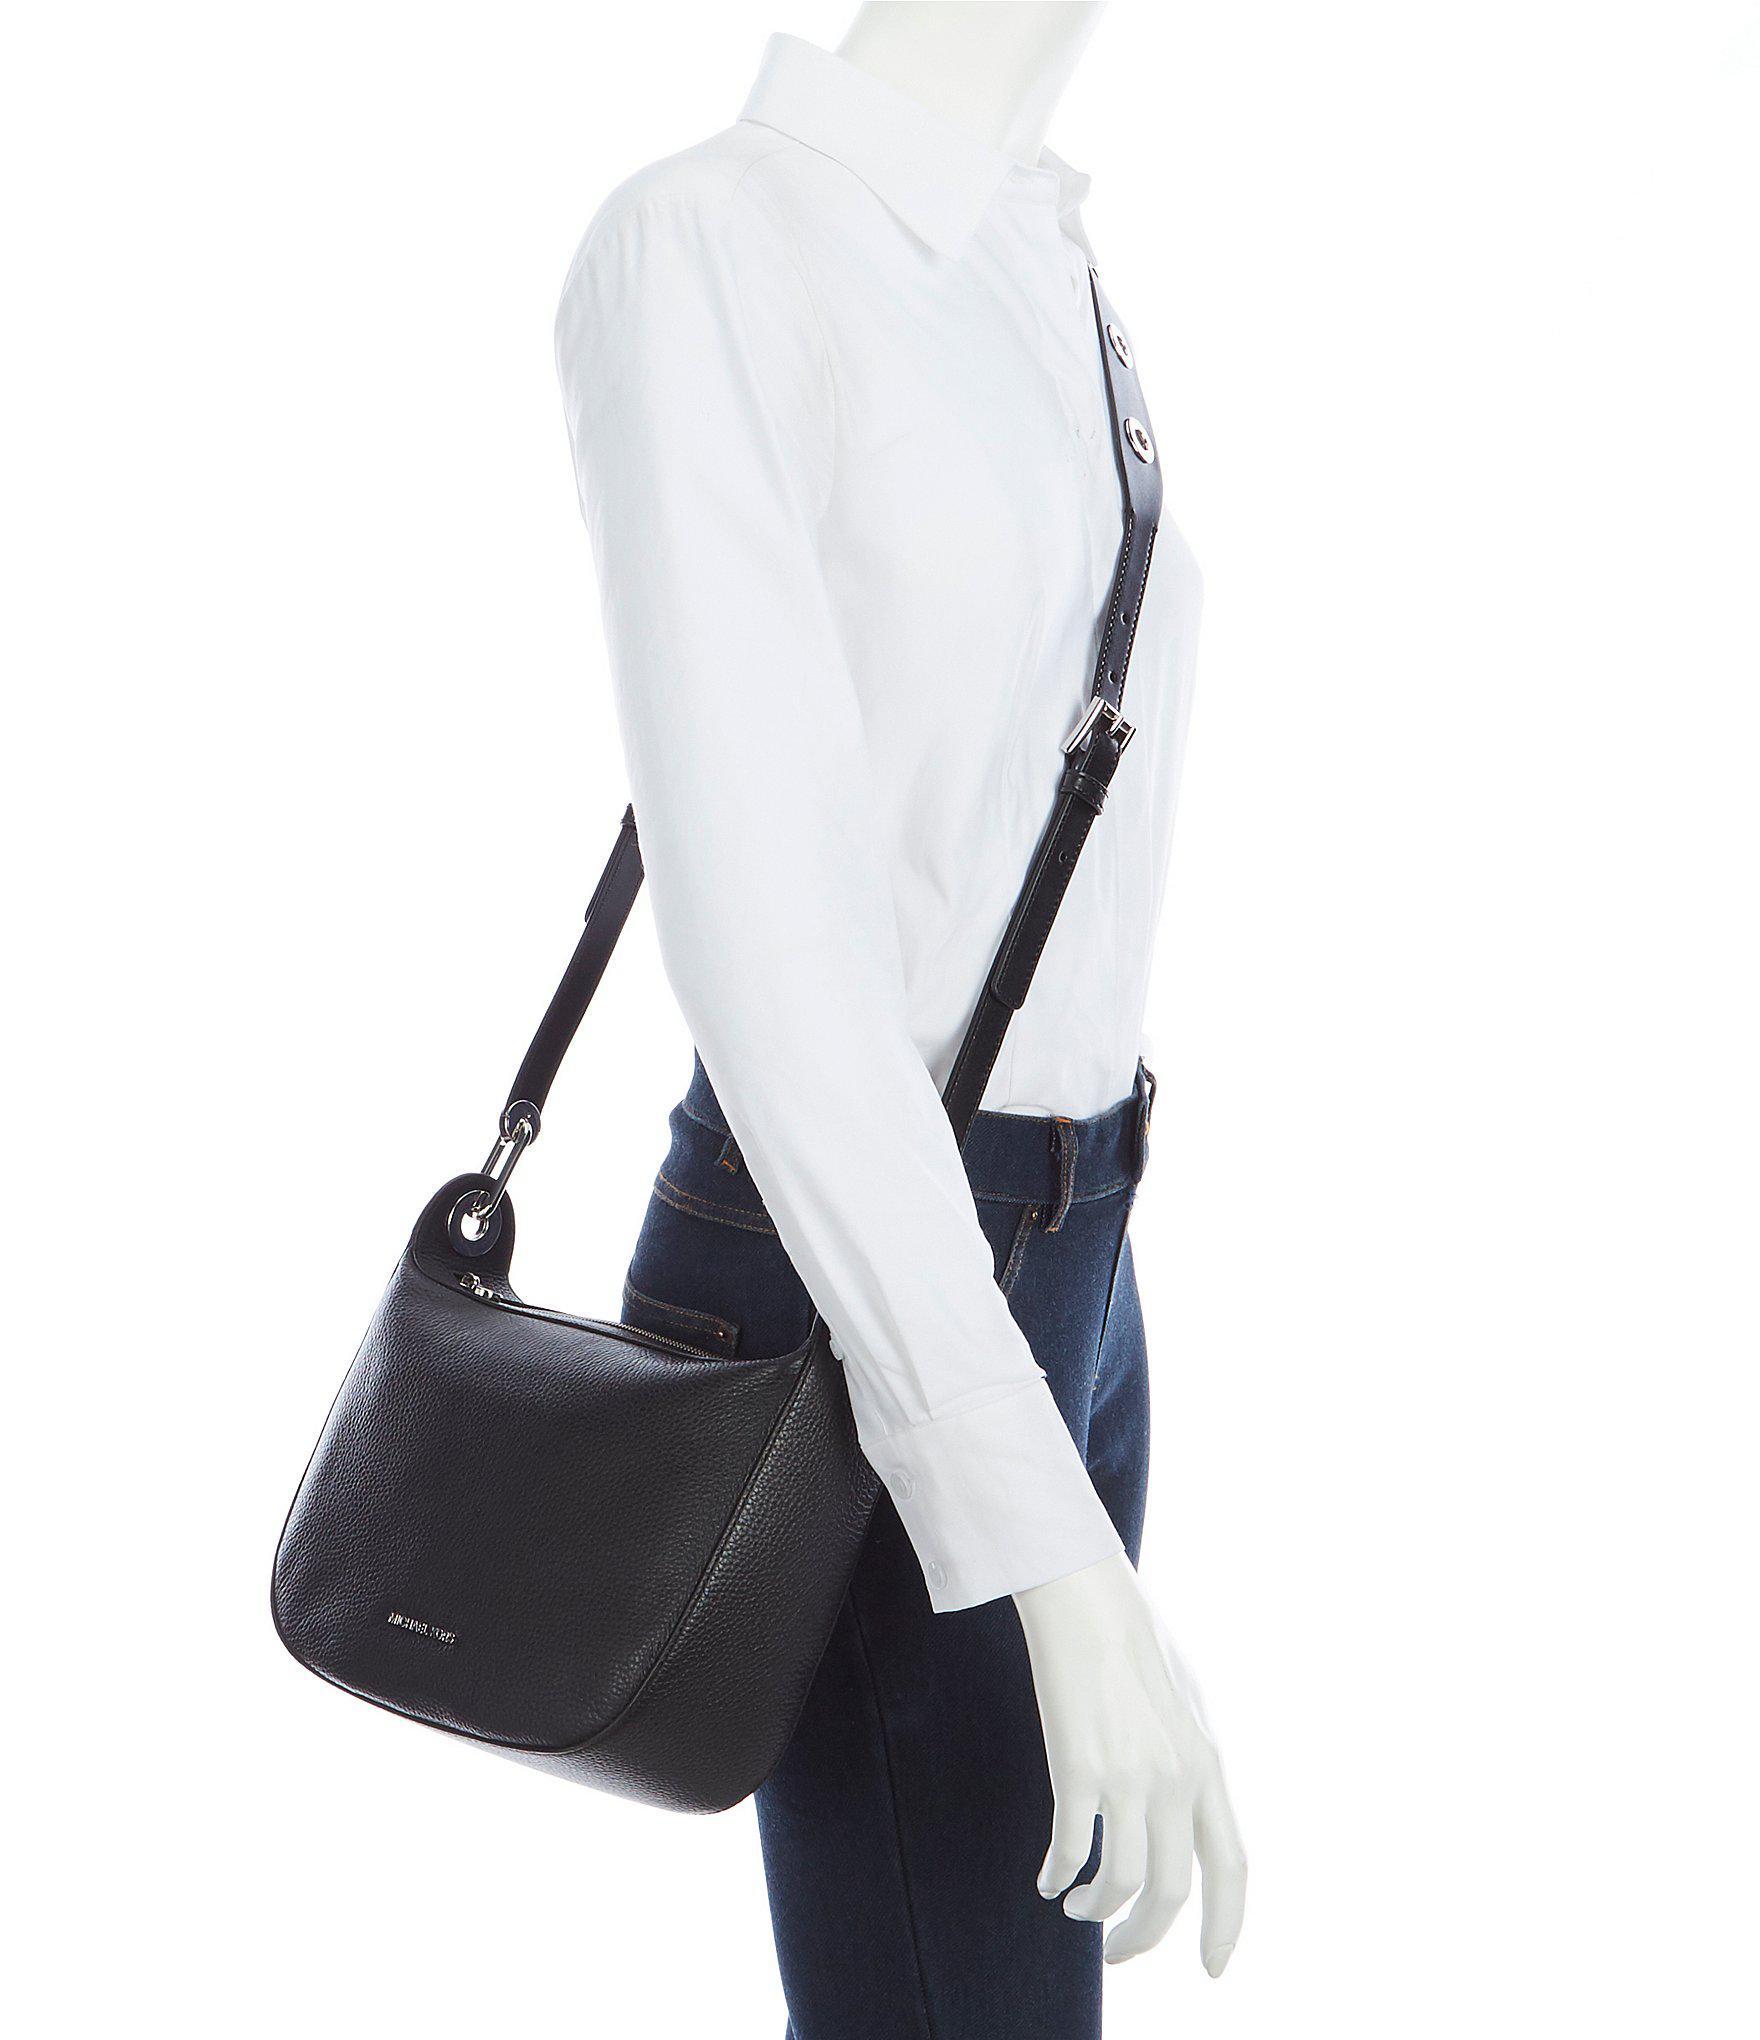 ca1e6fb1518d MICHAEL Michael Kors Barlow Medium Messenger Bag in Black - Lyst